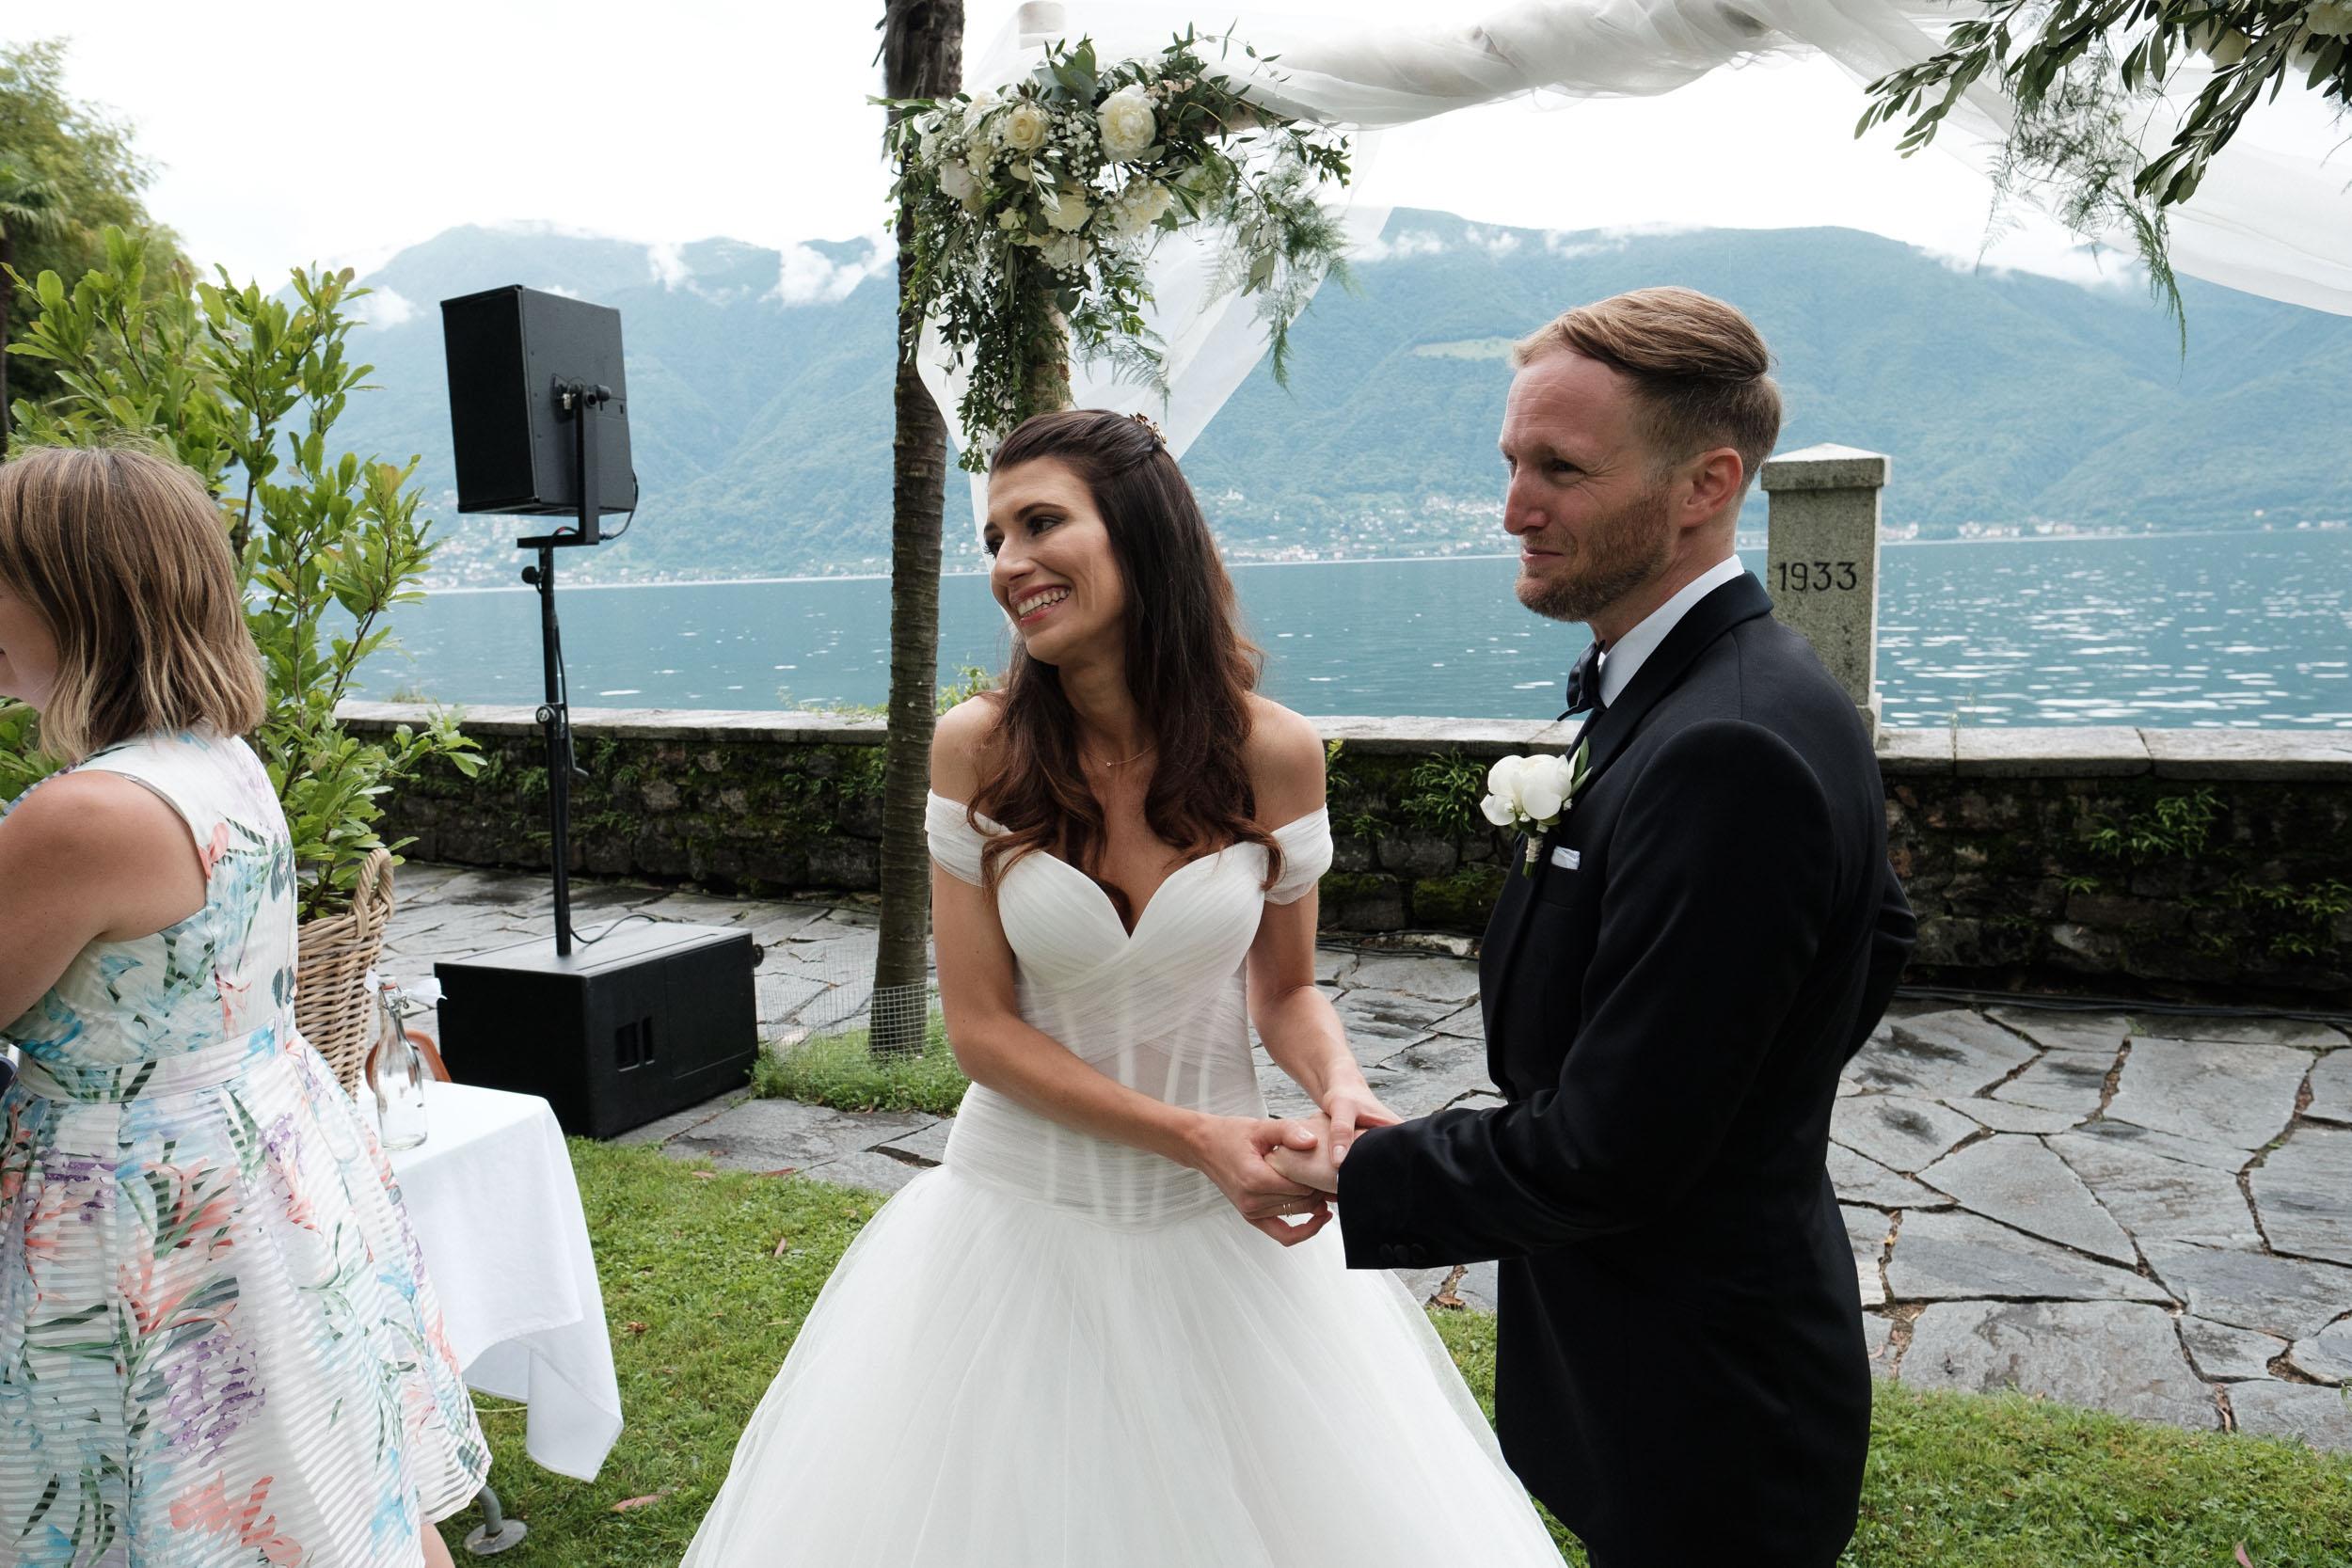 olivia-andreas-wedding-switzerland-314.jpg